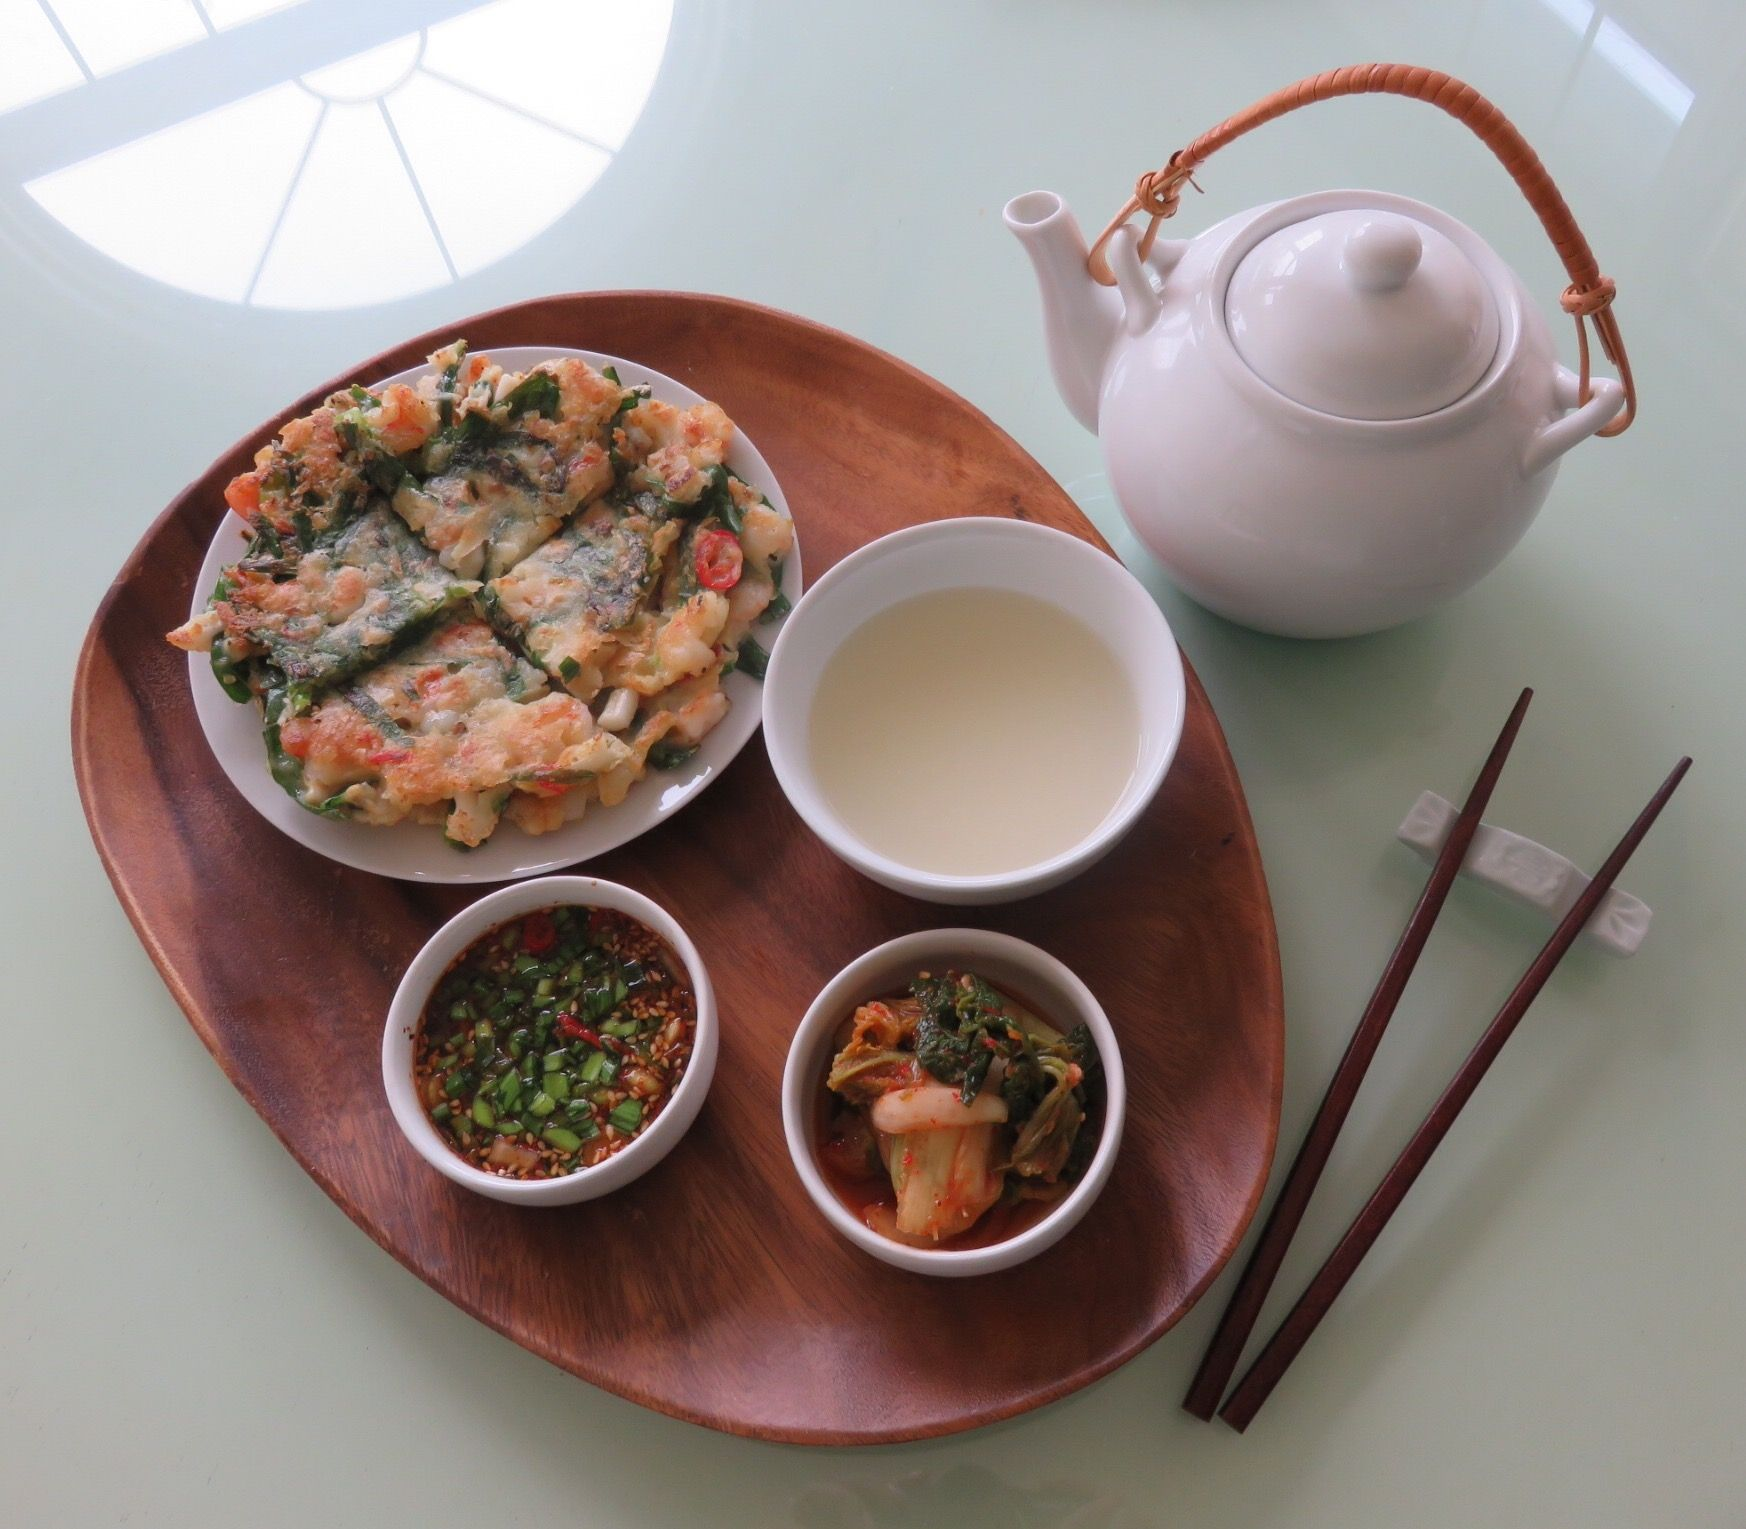 Today's Lunch- haemul Buchu-Jun. seafood and chives pancake. 오늘낮엔 서방님과 부추 해물파전을 부쳐 막걸리랑 크아~ ㅎㅎㅎ